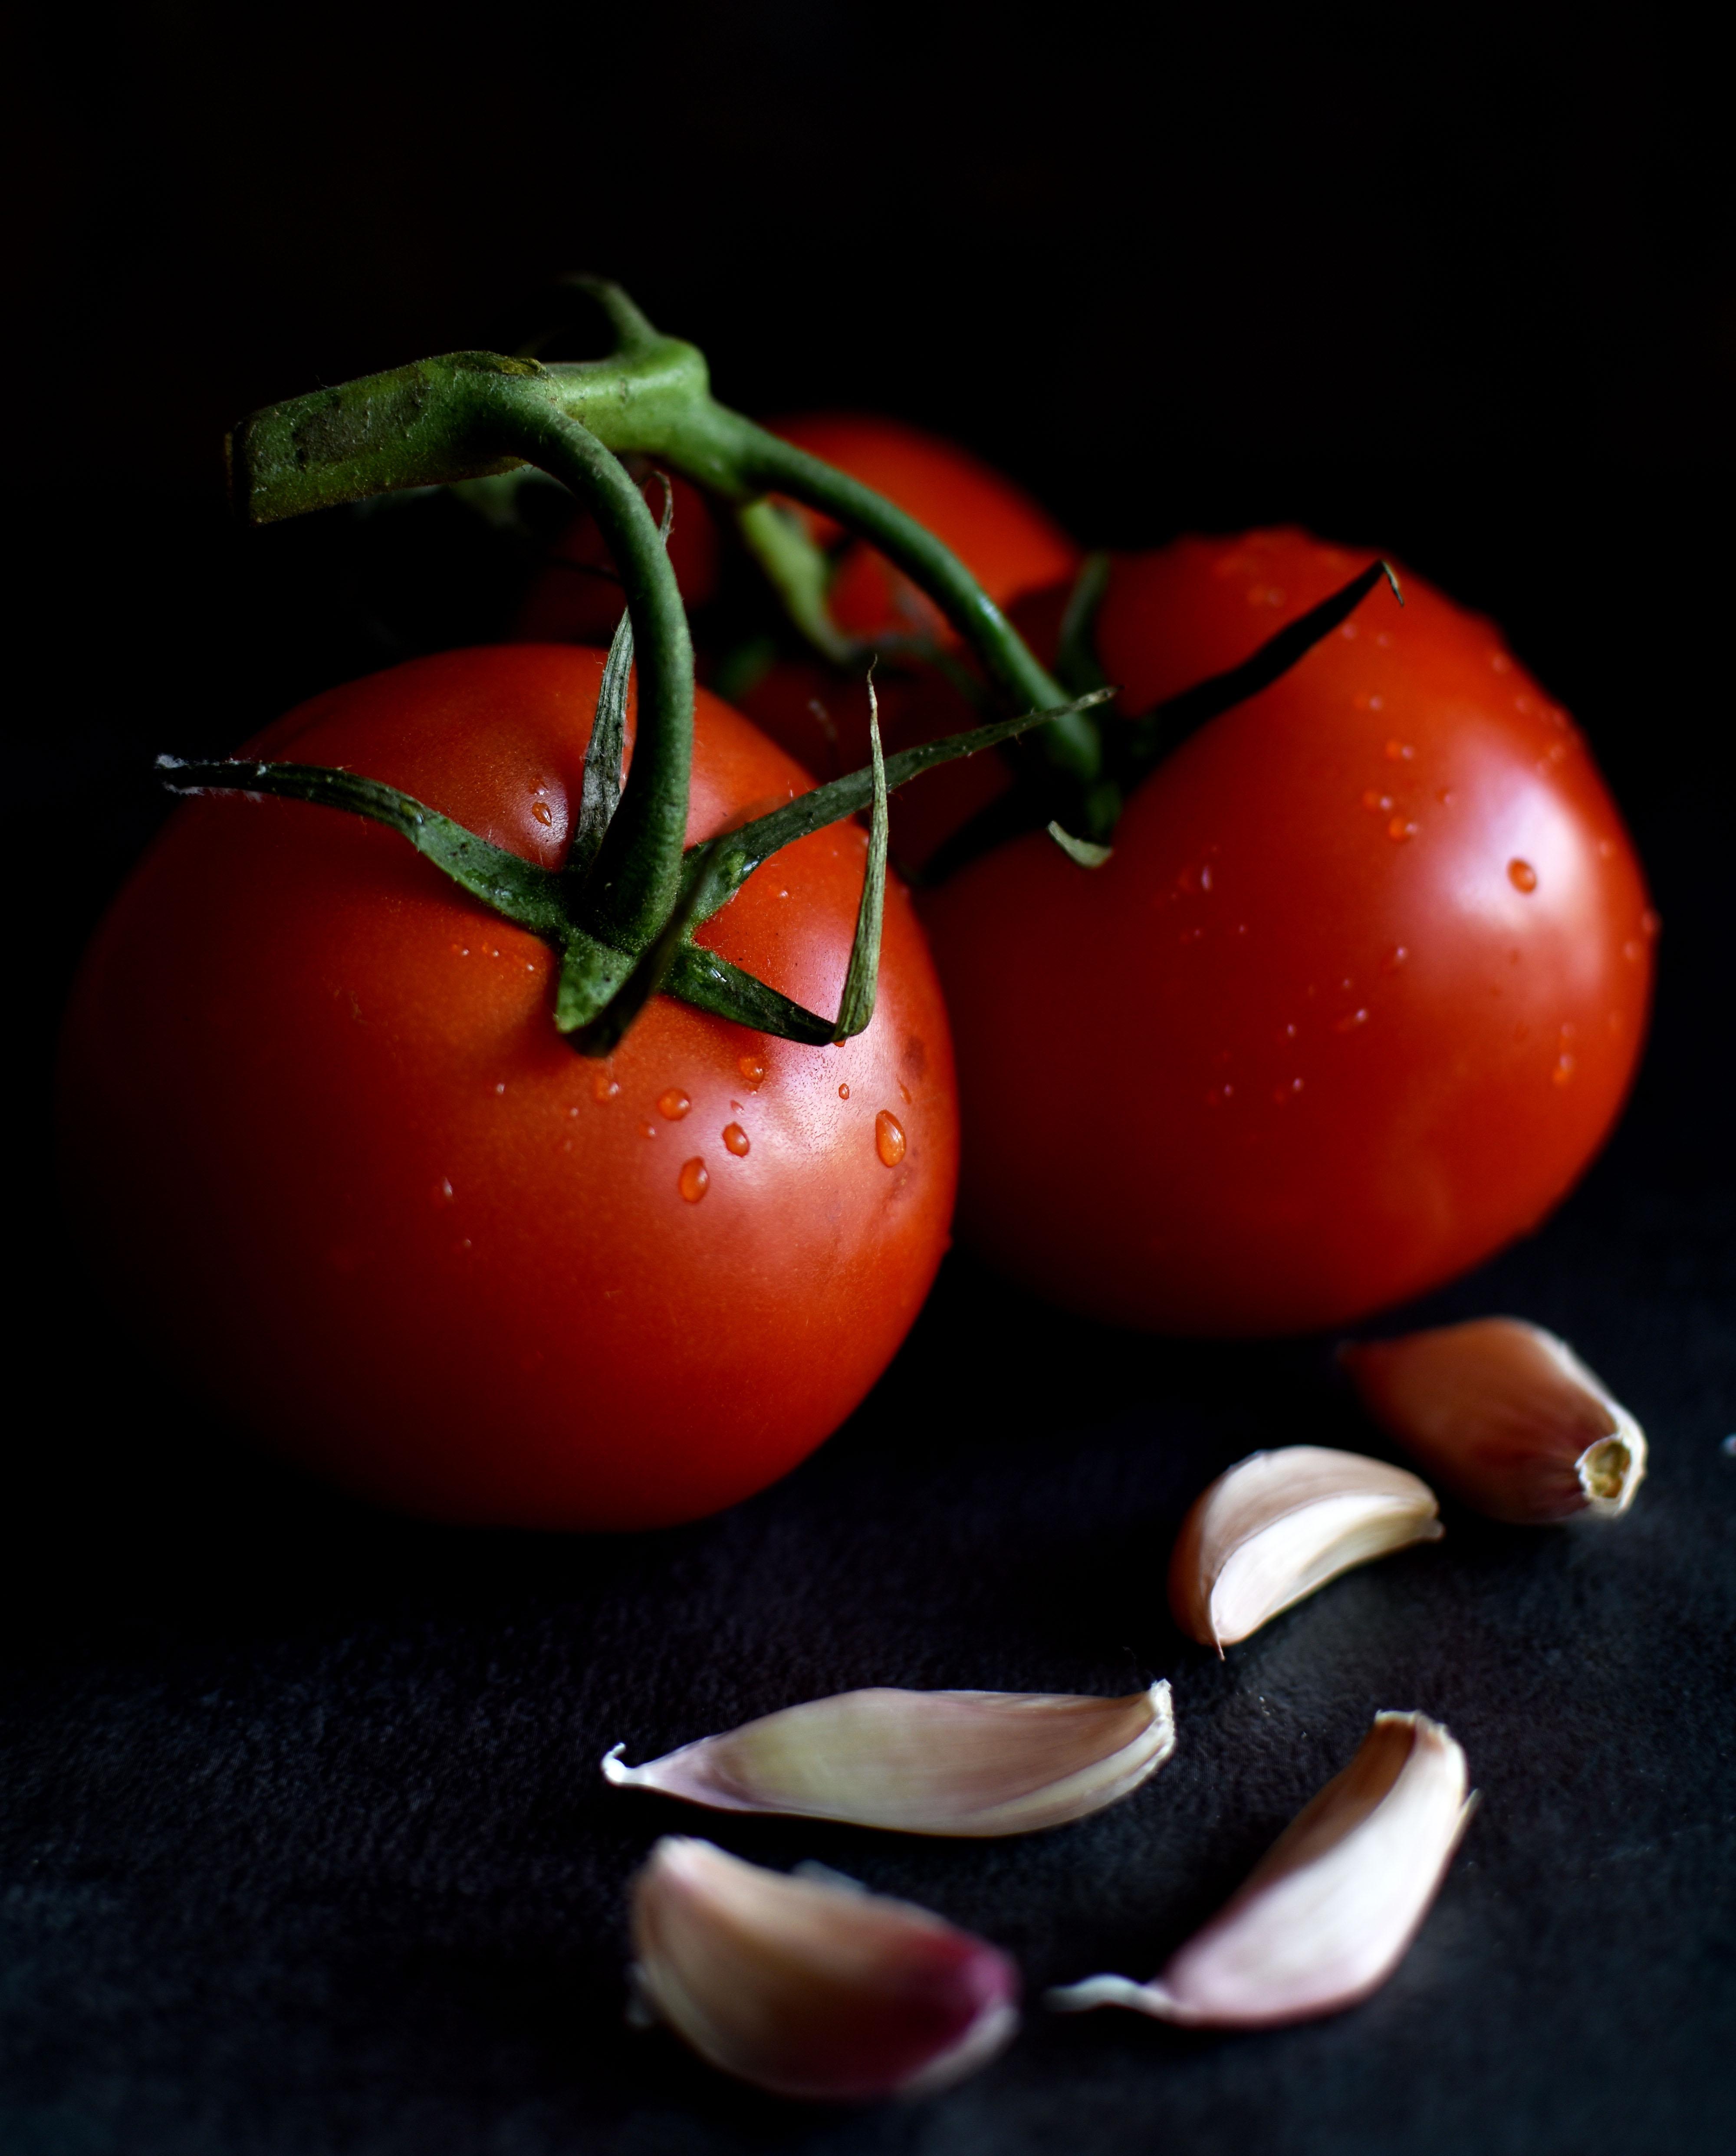 Kerala Style Tomato Rasam - Pepper Delight #pepperdelightblog #recipe #rasam #tomatorasam #keralarasam #kerala #onam #spicysoup #sadya #withoutrasampowder #vegan #homemaderasam #festivals